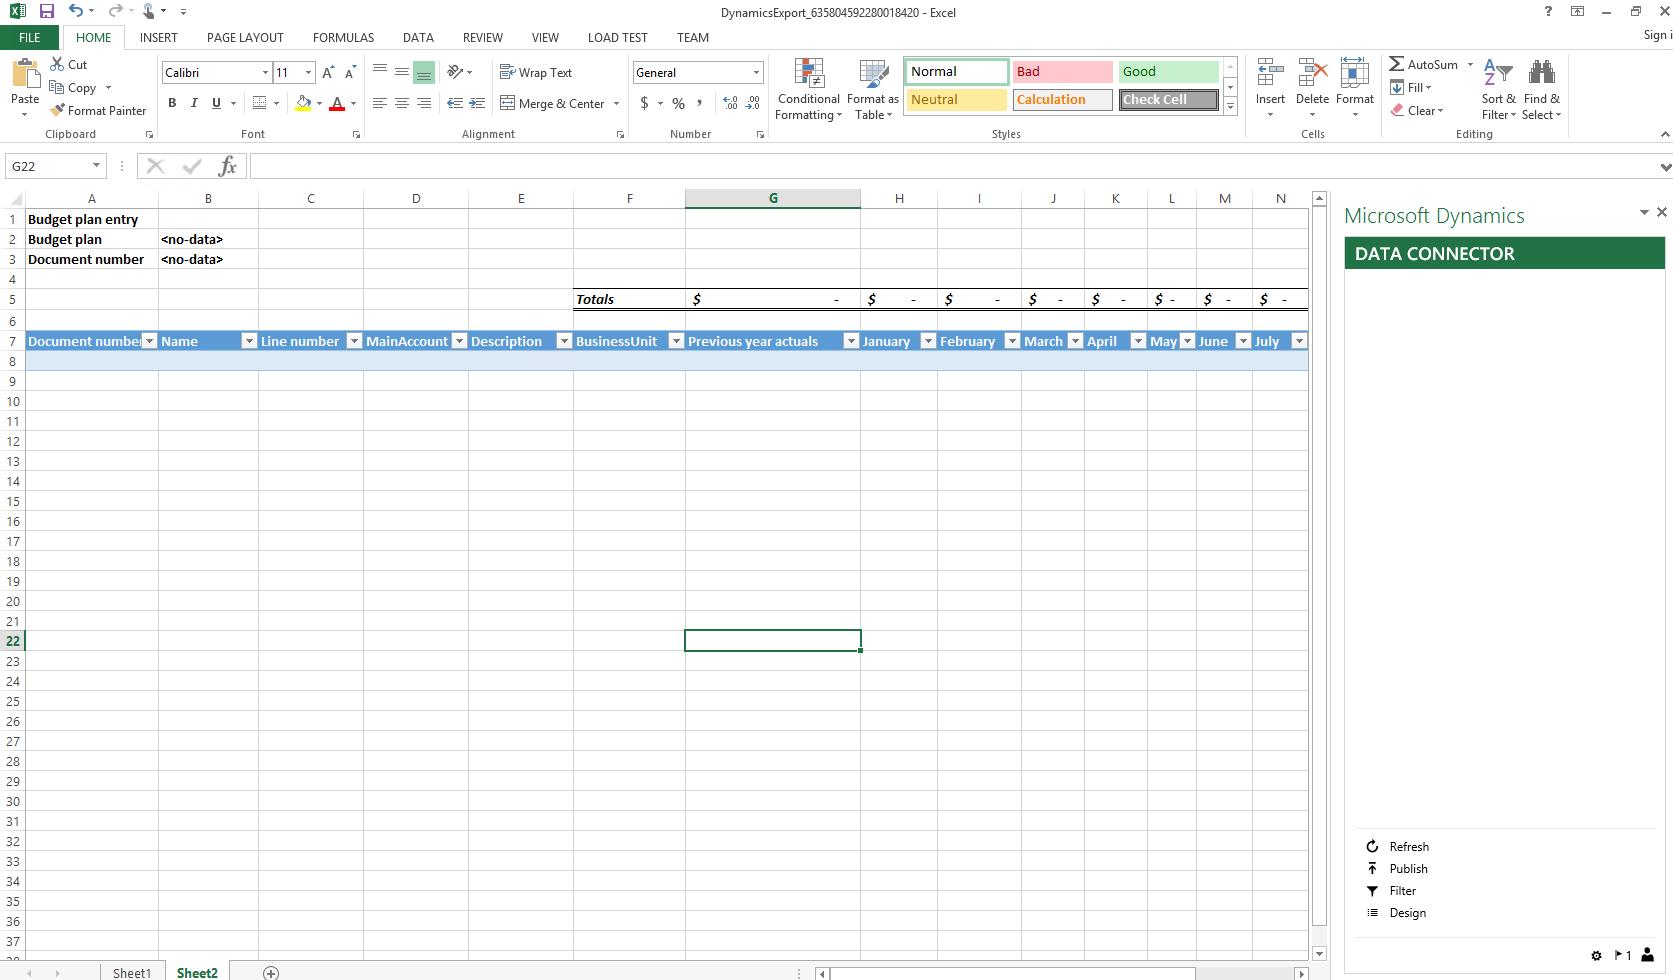 Budgetplanung - Finance & Operations   Dynamics 365   #MSDyn365FO ...